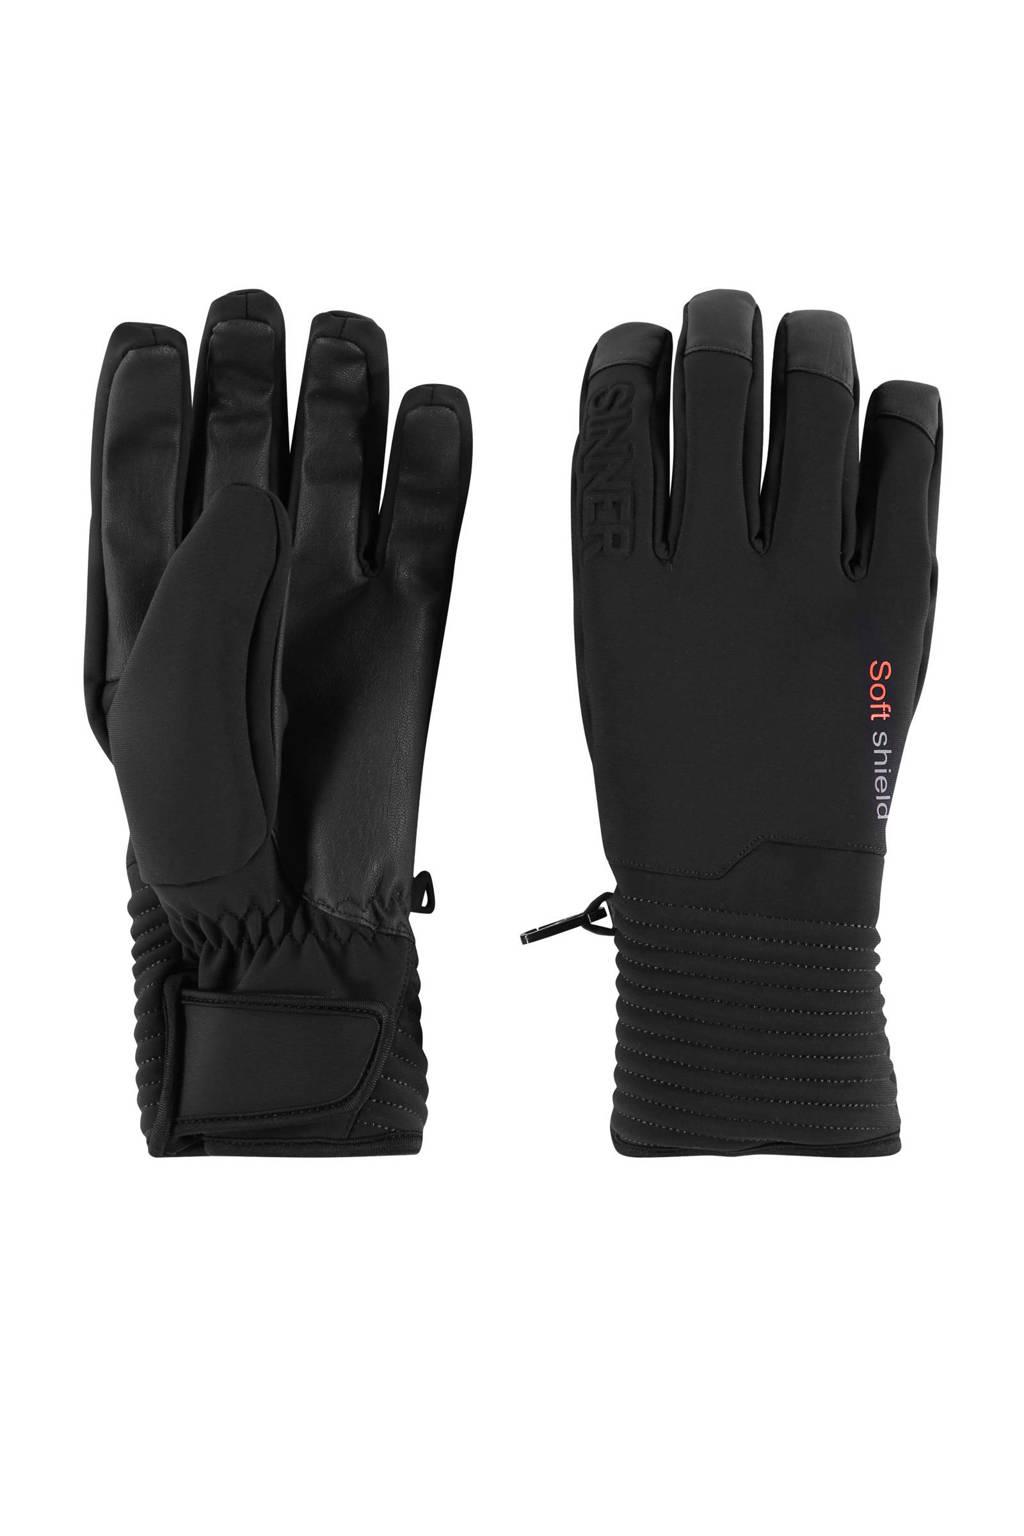 Sinner skihandschoenen Ski Mont zwart, Zwart